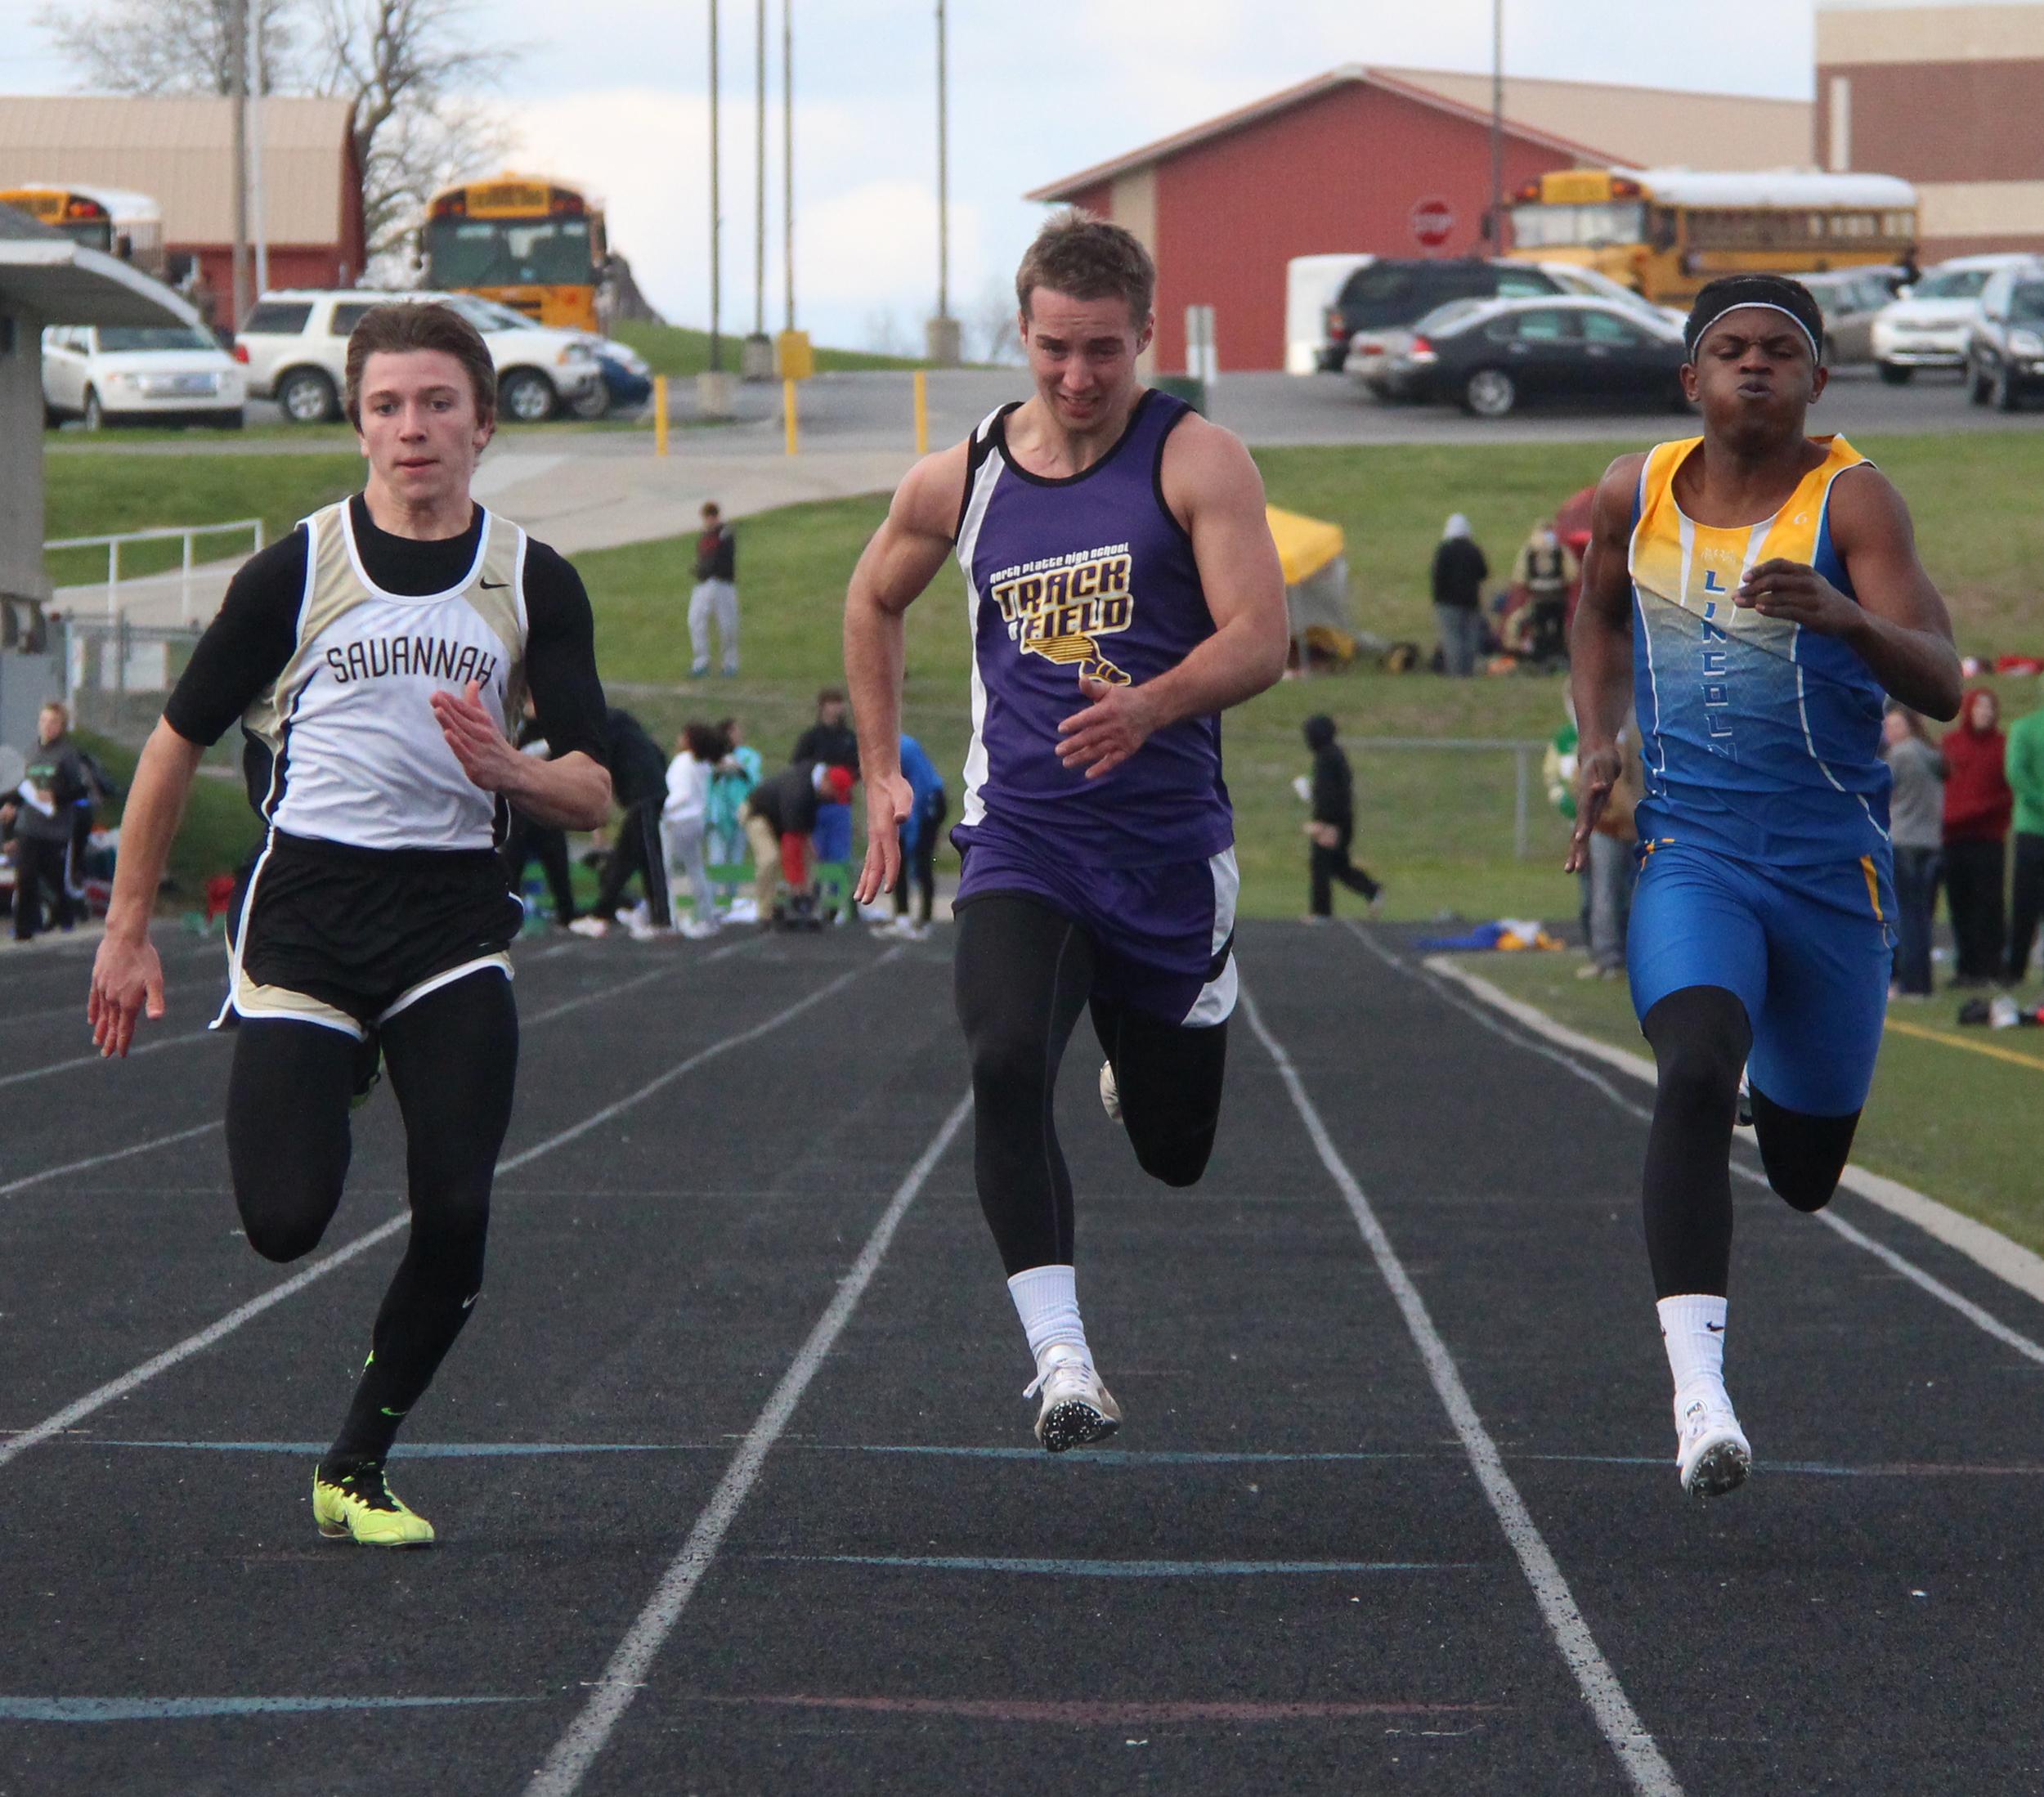 ROSS MARTIN/Citizen photo North Platte senior Jordan Hendricks, center, puts his head down as he finishes the 100-meter dash race Friday, April 1 in the Smithville Invitational at Smithville High School.